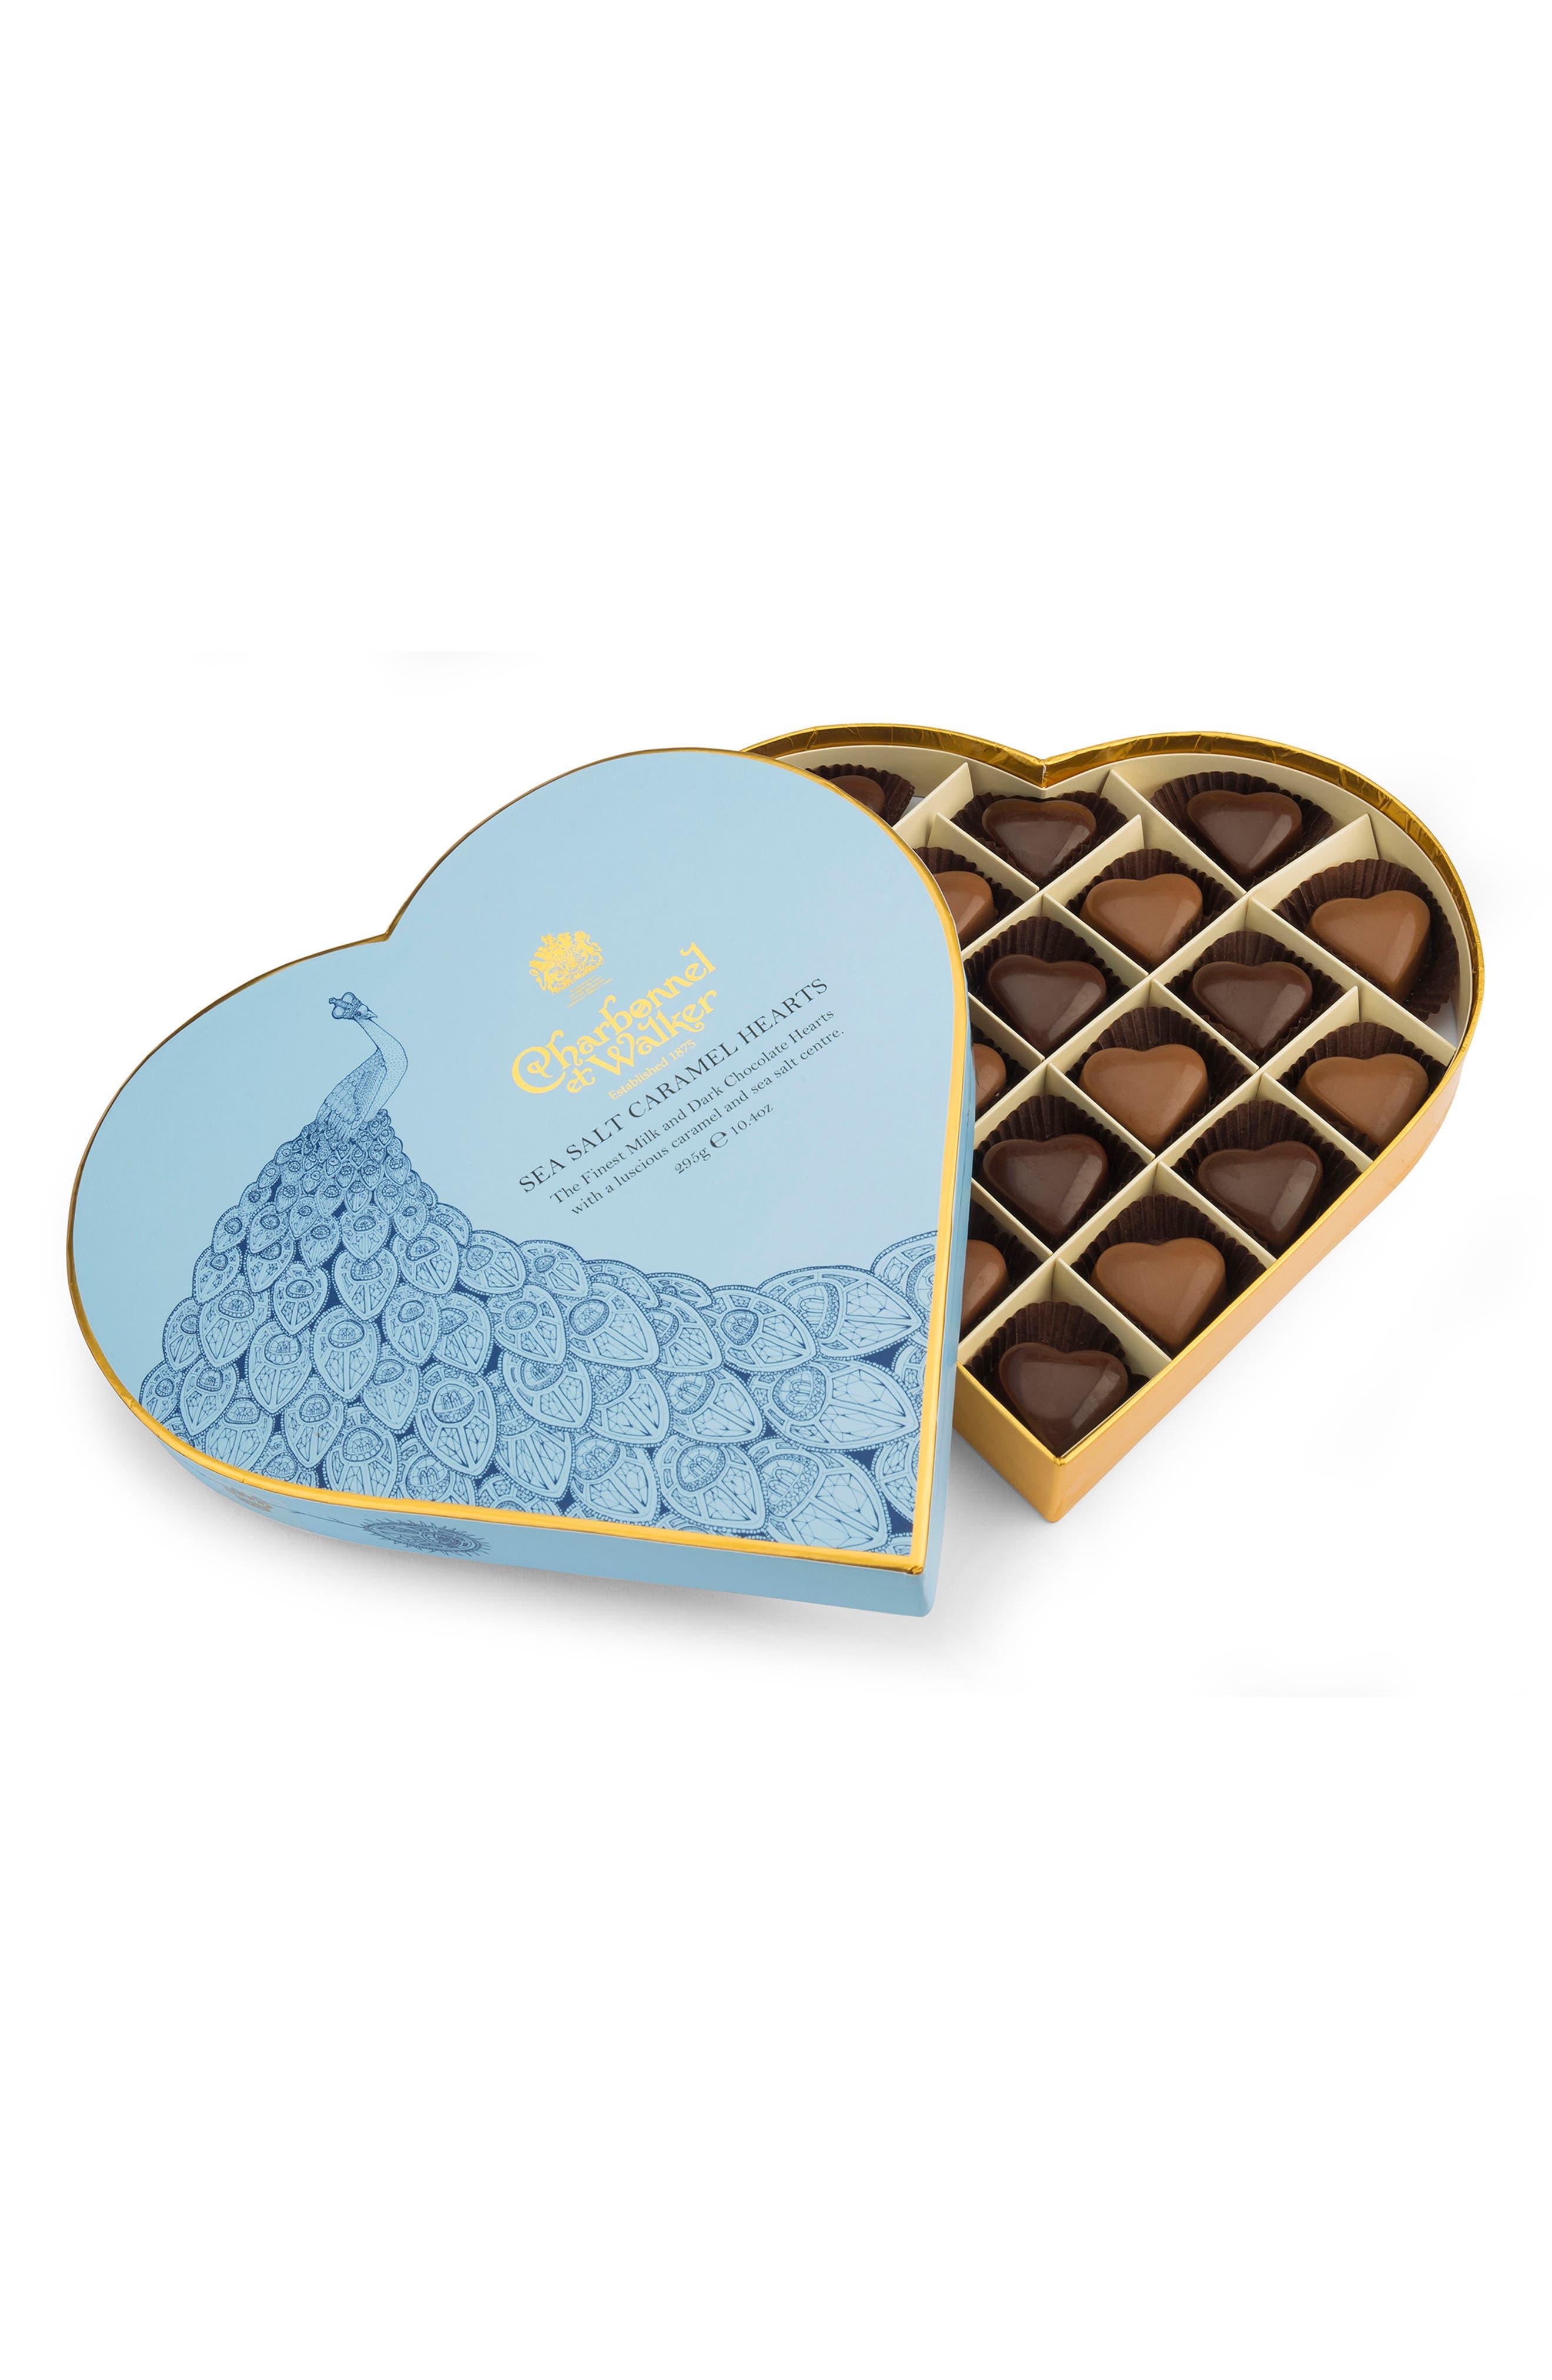 Charbonnel et Walker Sea Salt Caramel Chocolates in Heart Shaped Gift Box